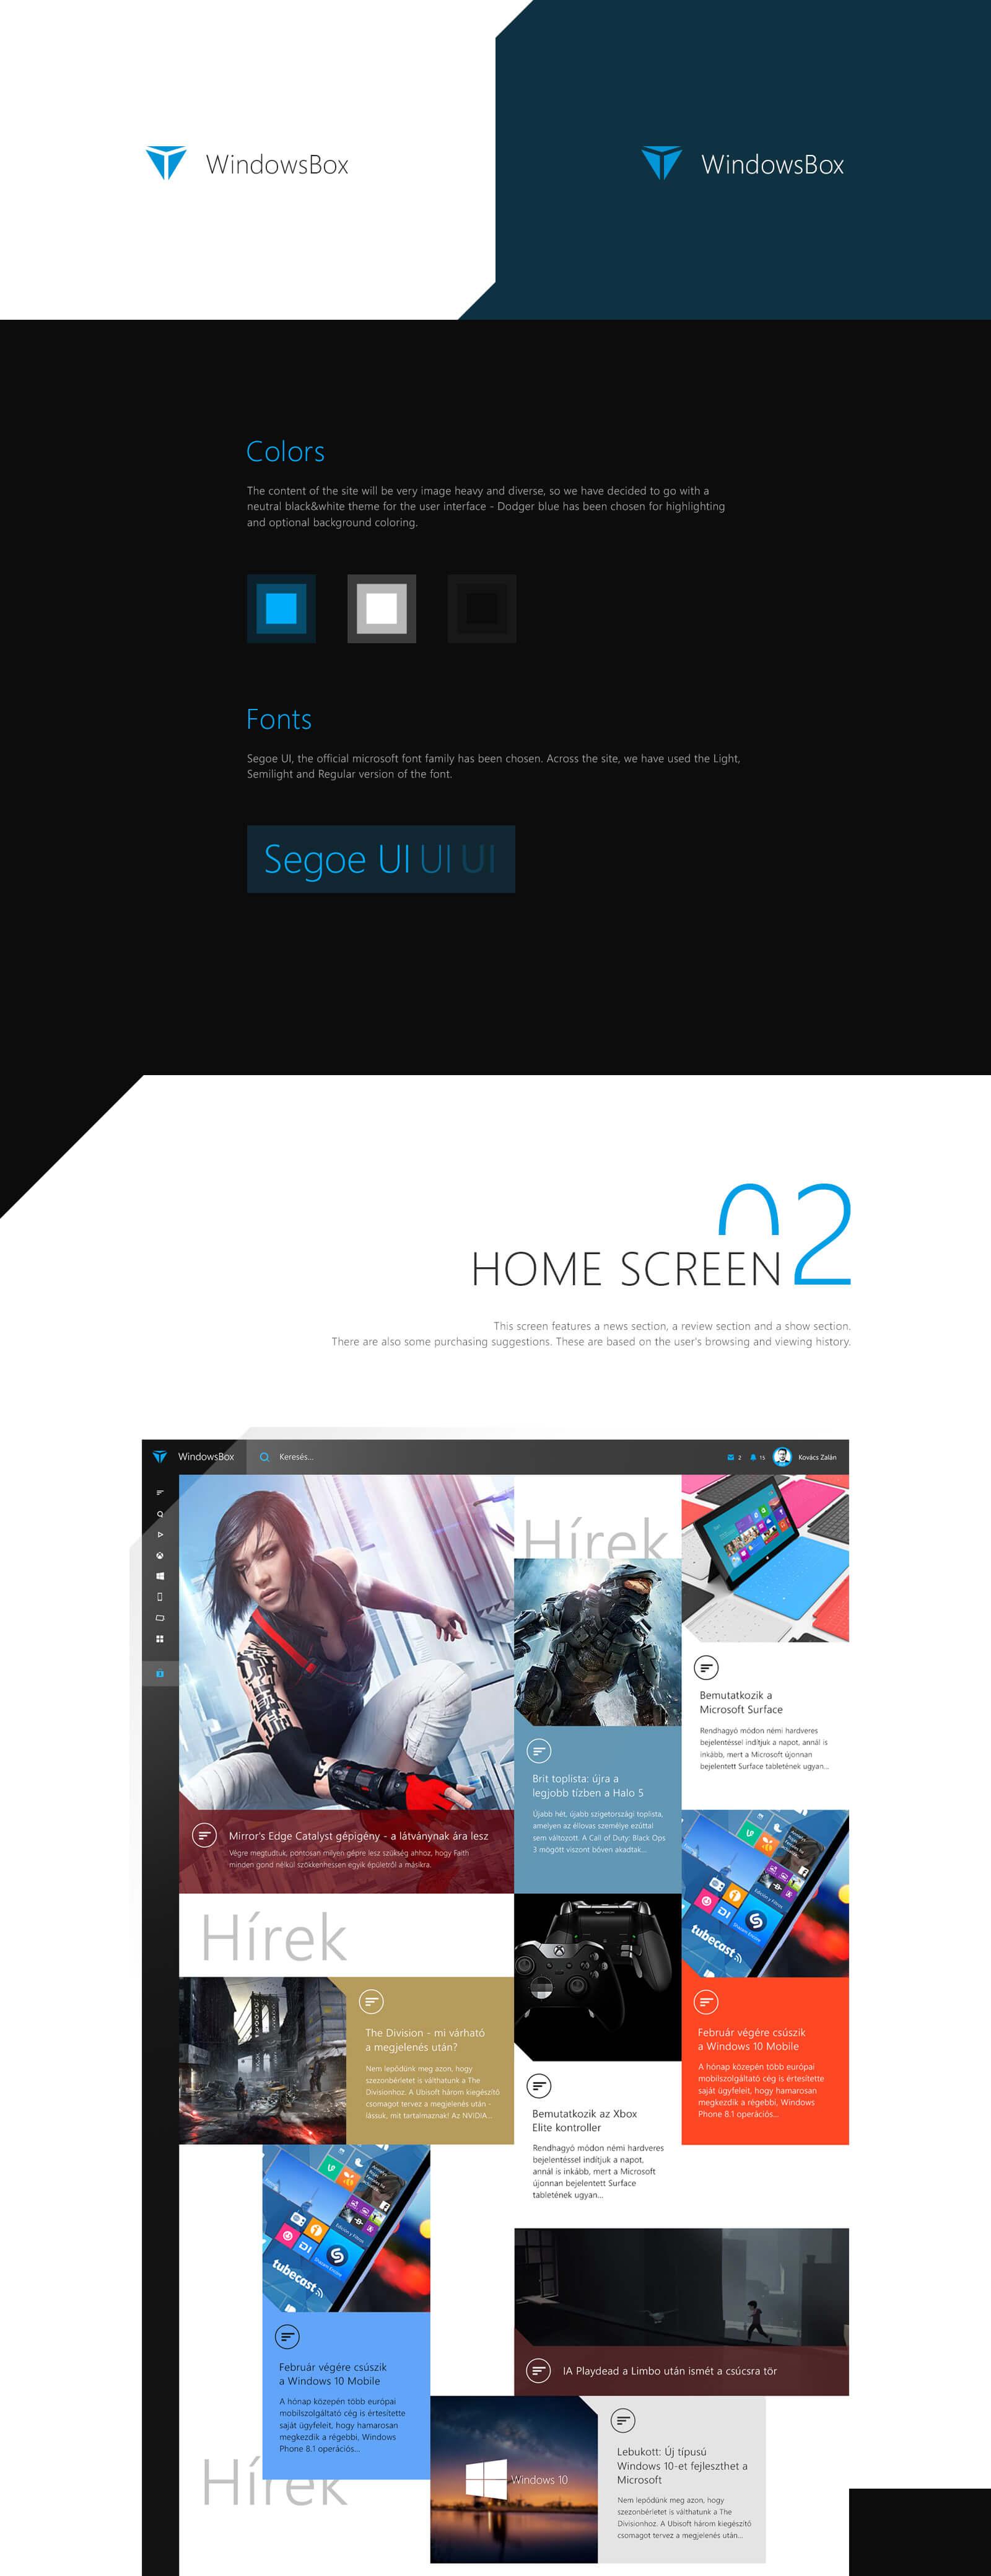 Windows box website rebrand design feature by Finsweet